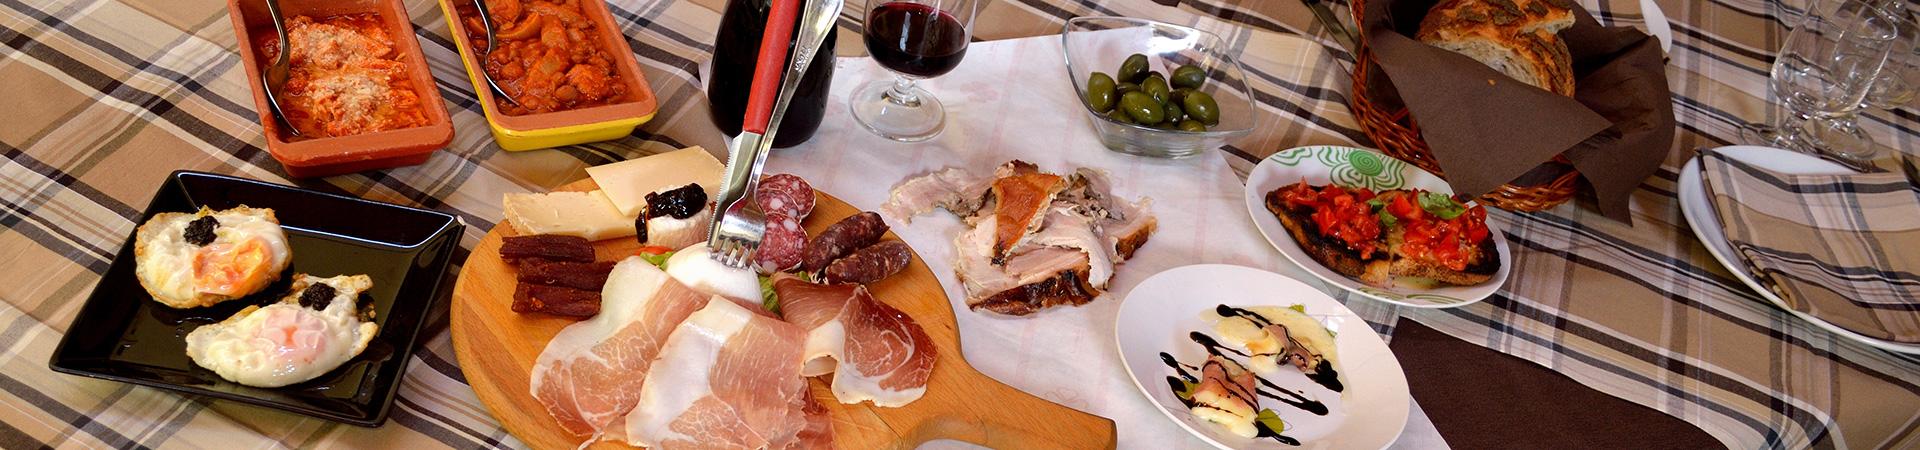 cuisine of rome traditional antipasti of Rome and Ariccia